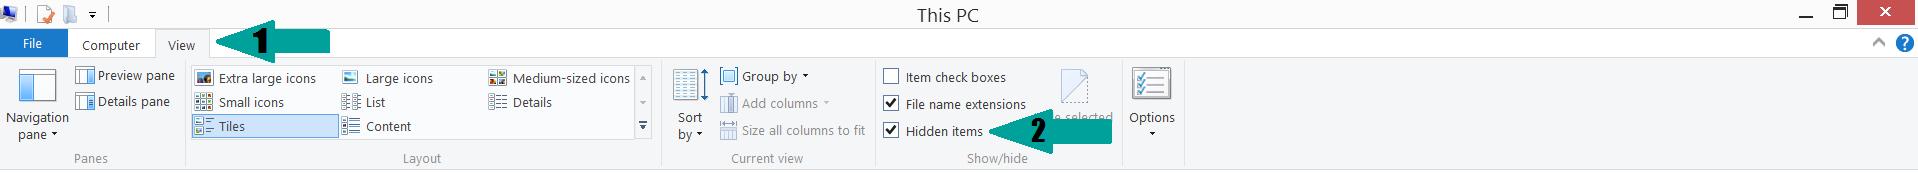 show-hidden-files-win8-10